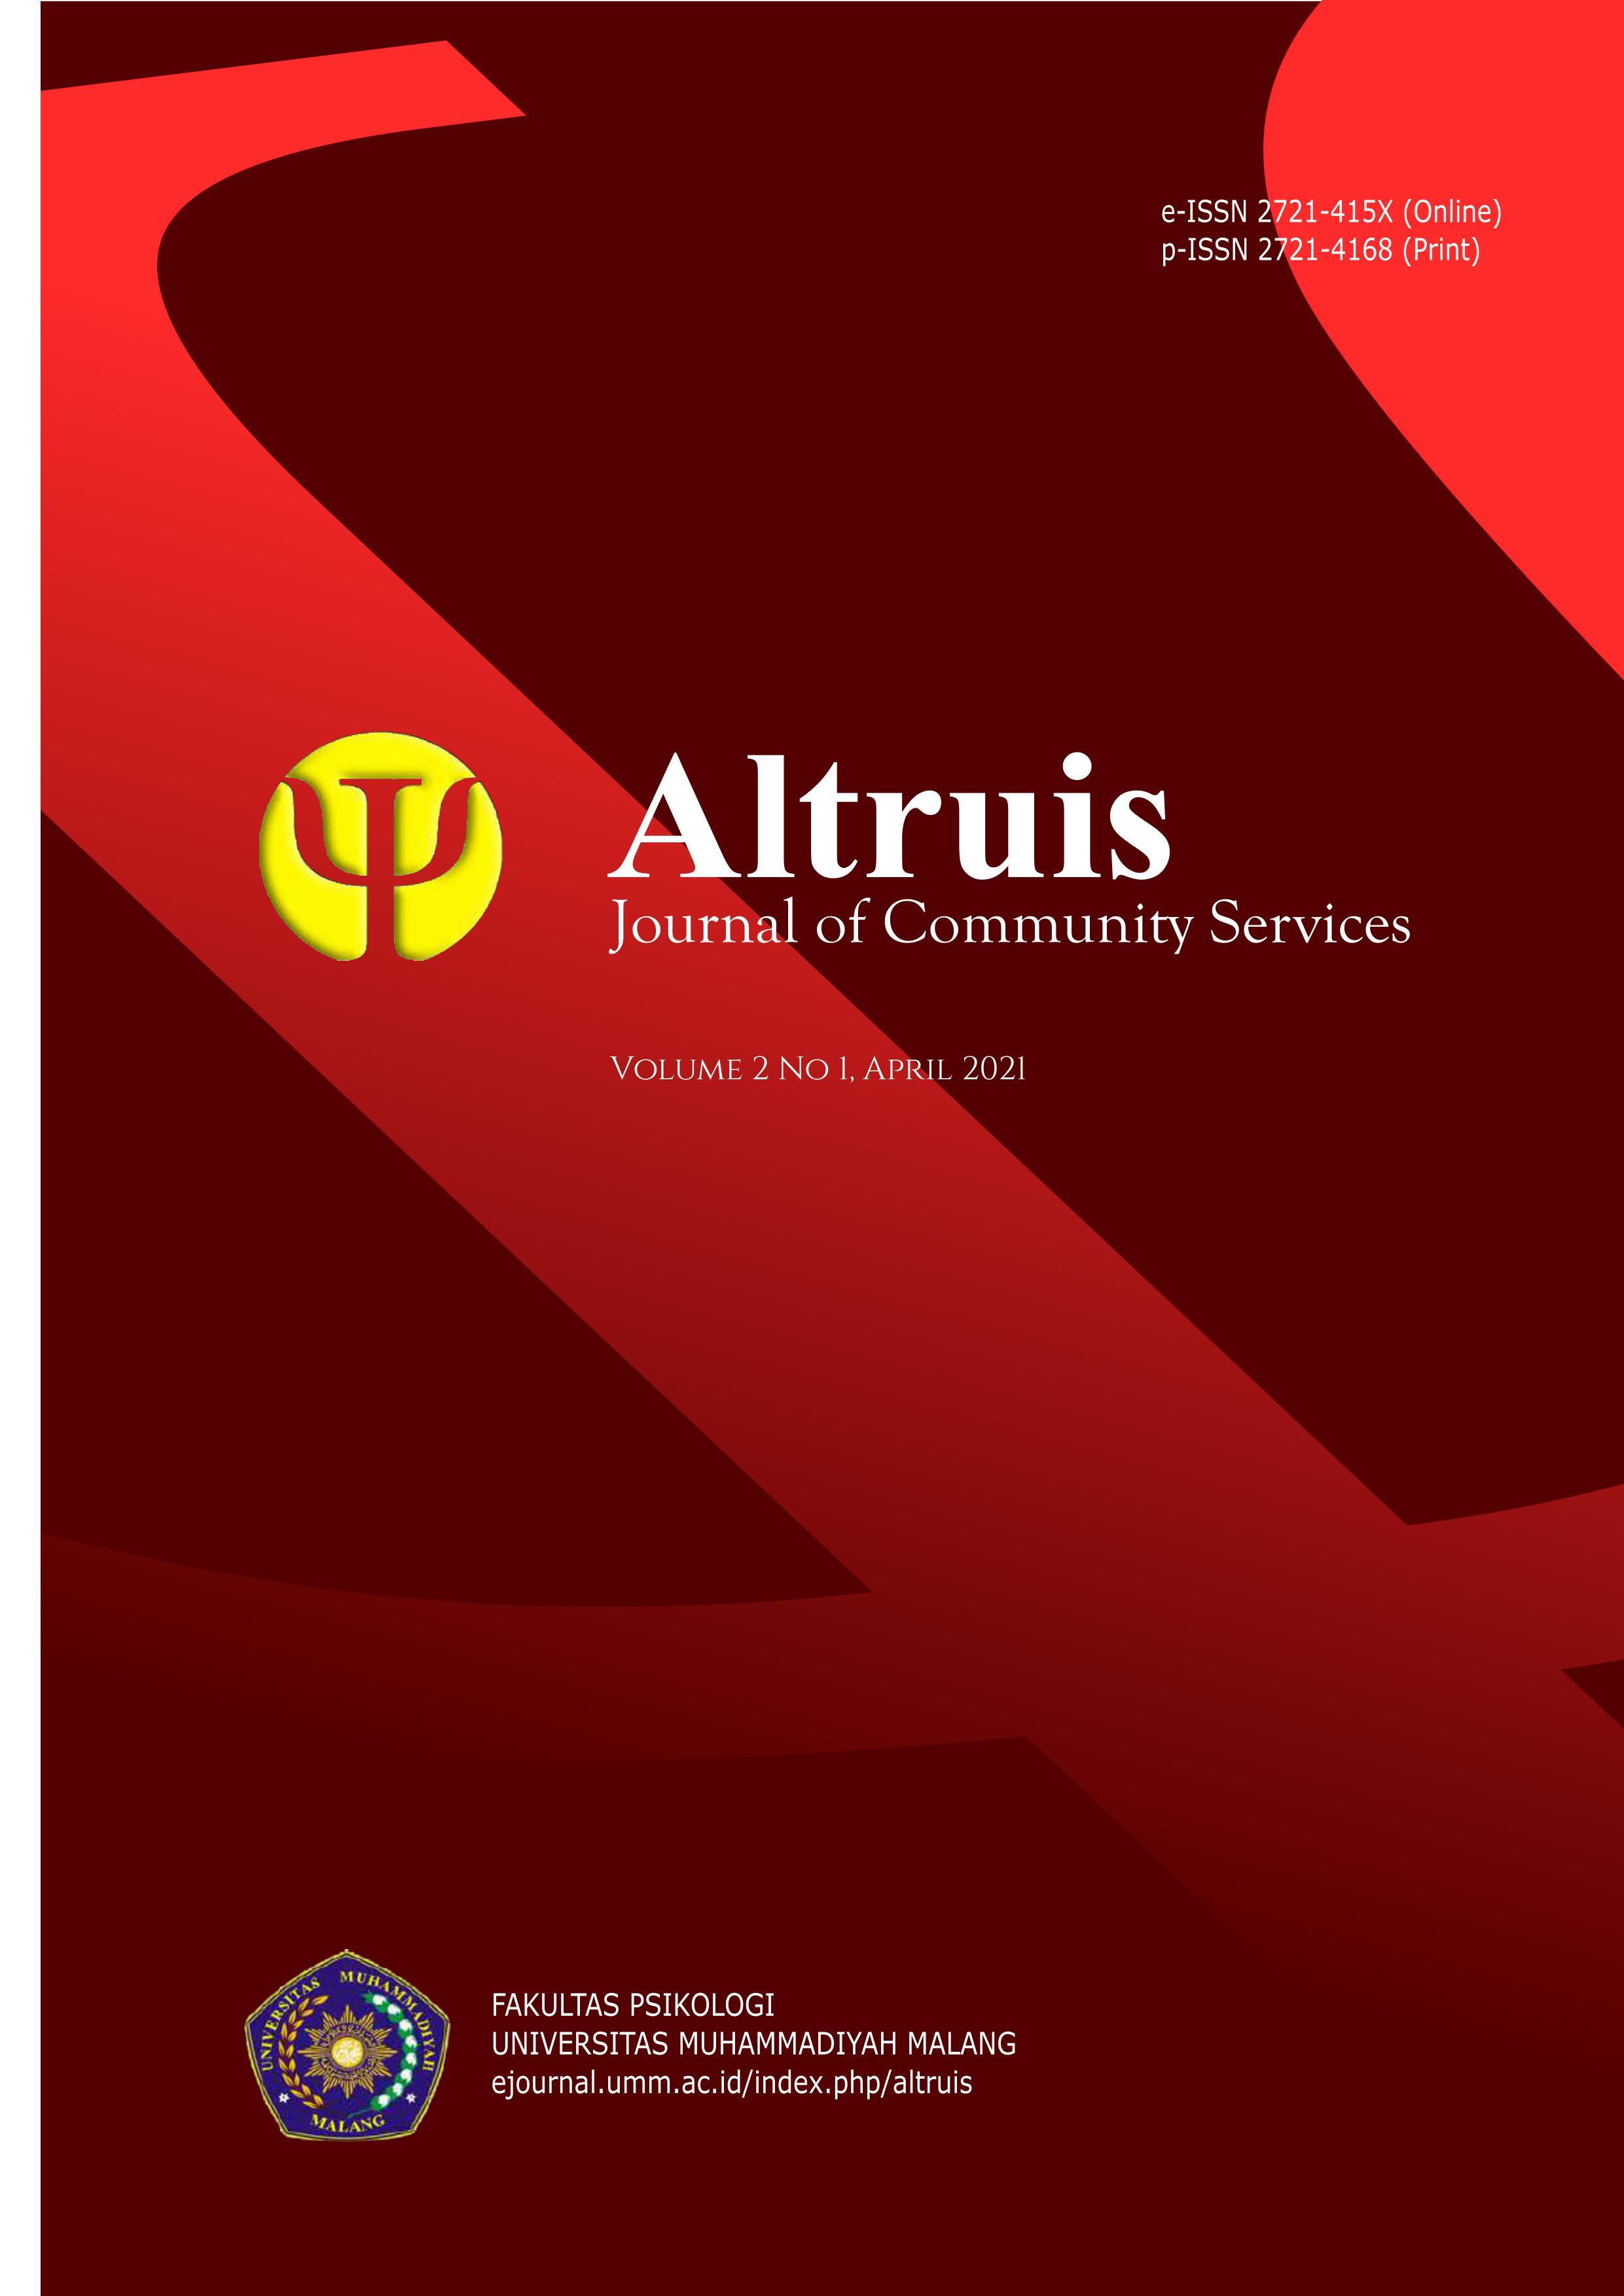 View Vol. 2 No. 1 (2021): Altruis